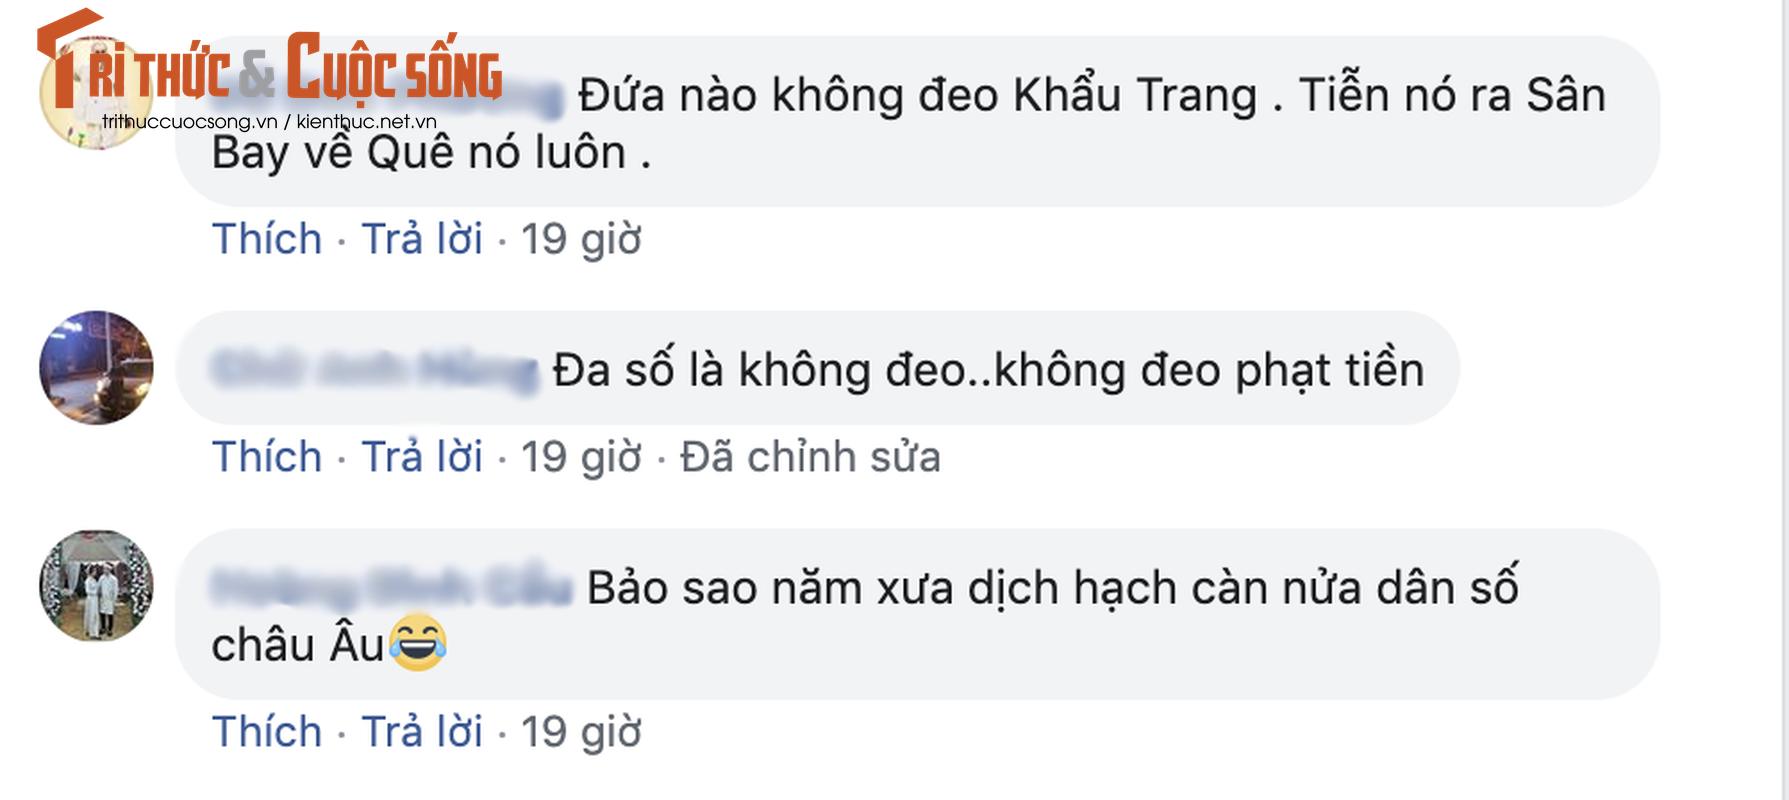 "Dan tinh buc xuc du khach nuoc ngoai ""luoi"" deo khau trang giua dich Covid-19-Hinh-7"